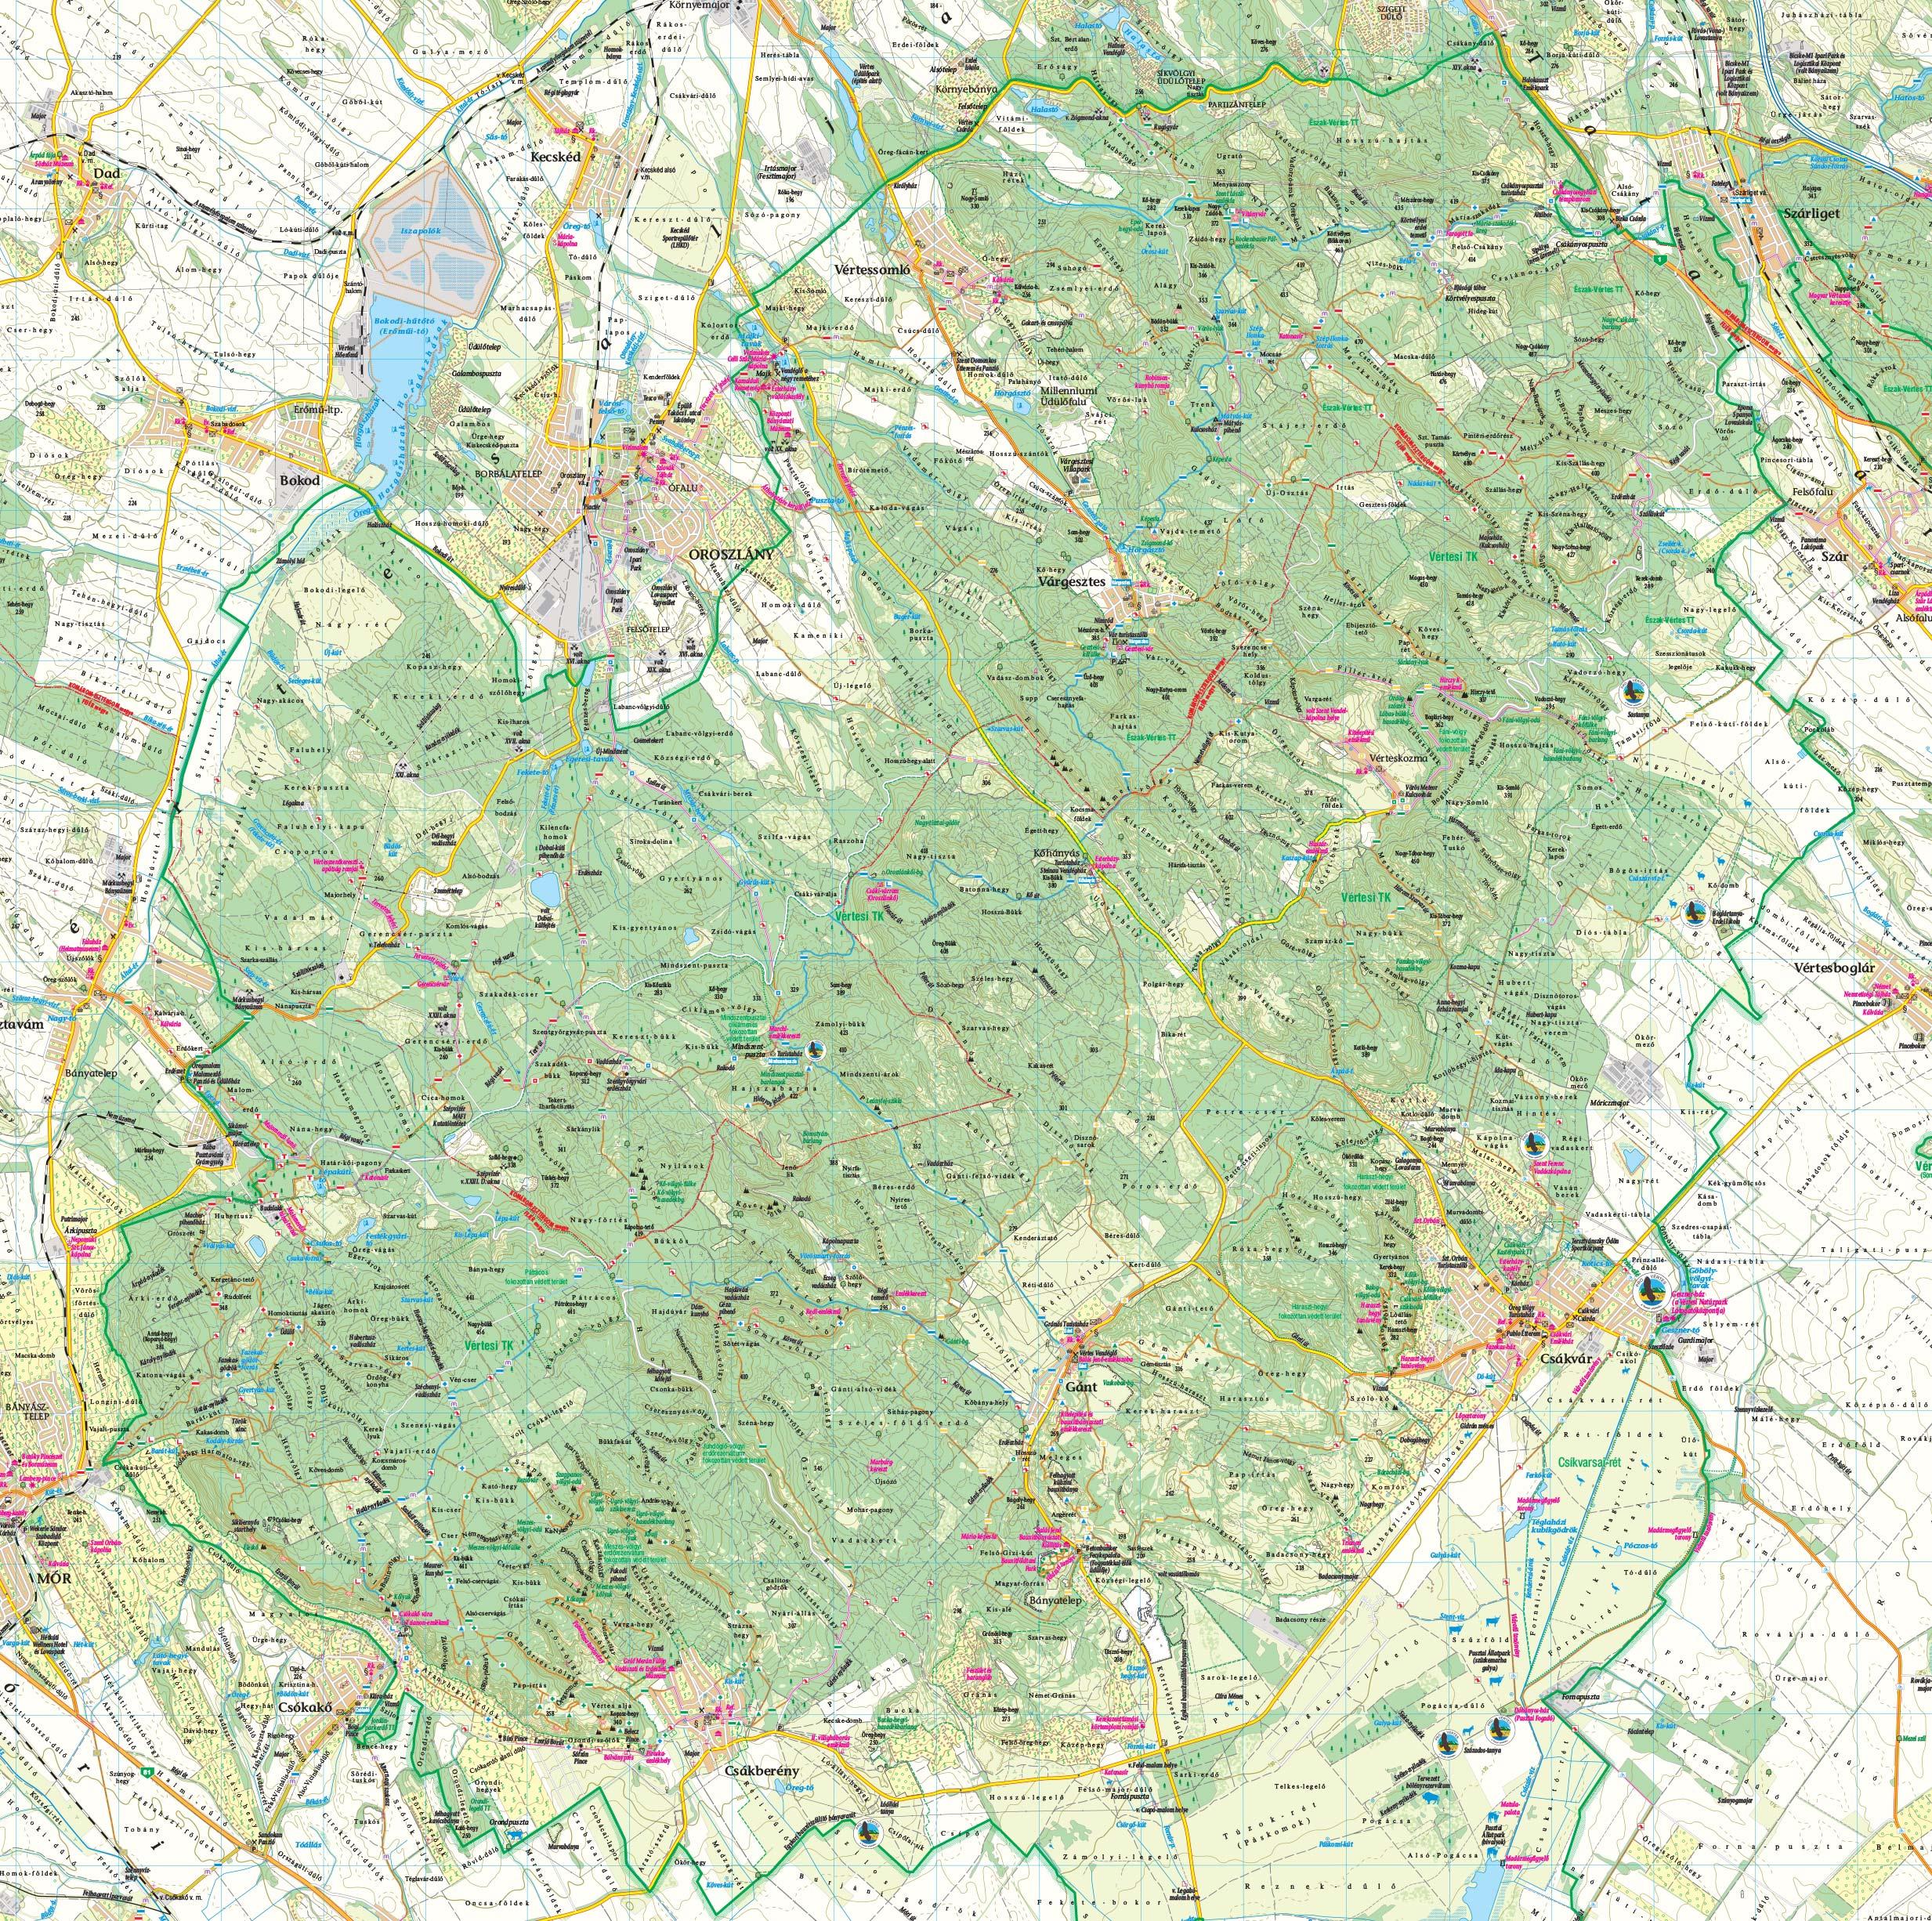 vértes térkép Térkép vértes térkép